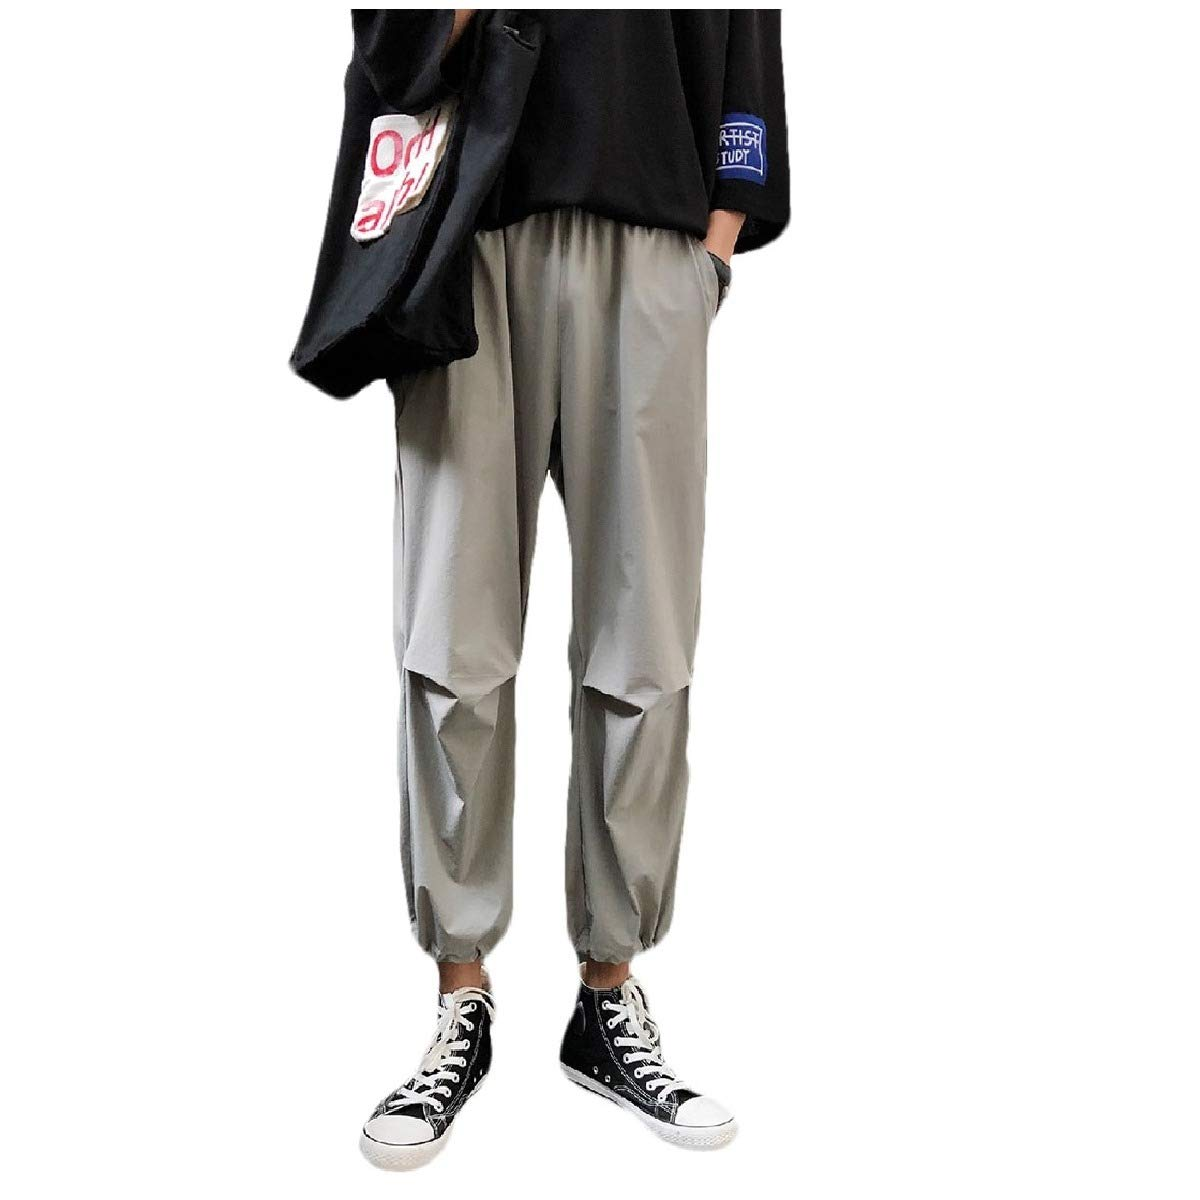 RDHOPE-Men Lightweight Loose Fit Elastic Waist Beam Foot Trousers Pants